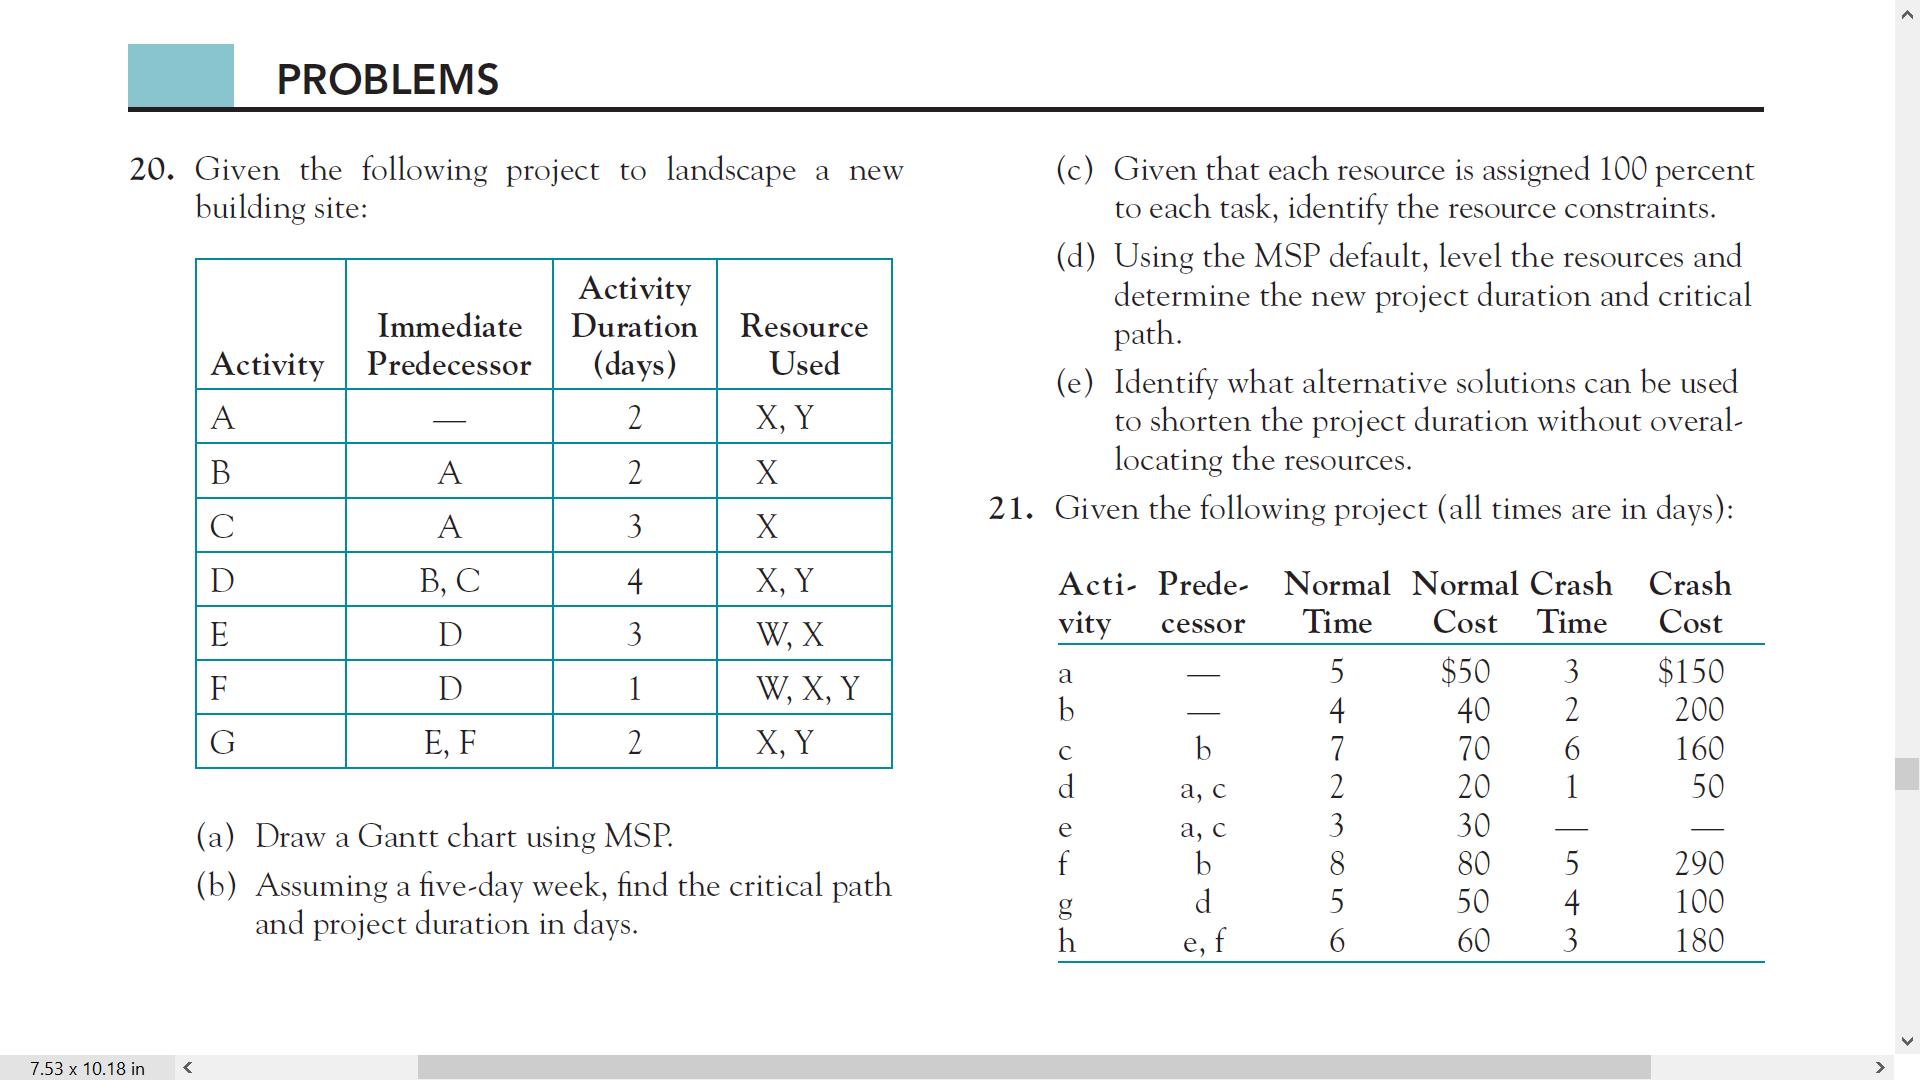 The crash cost per day per activity 7 points